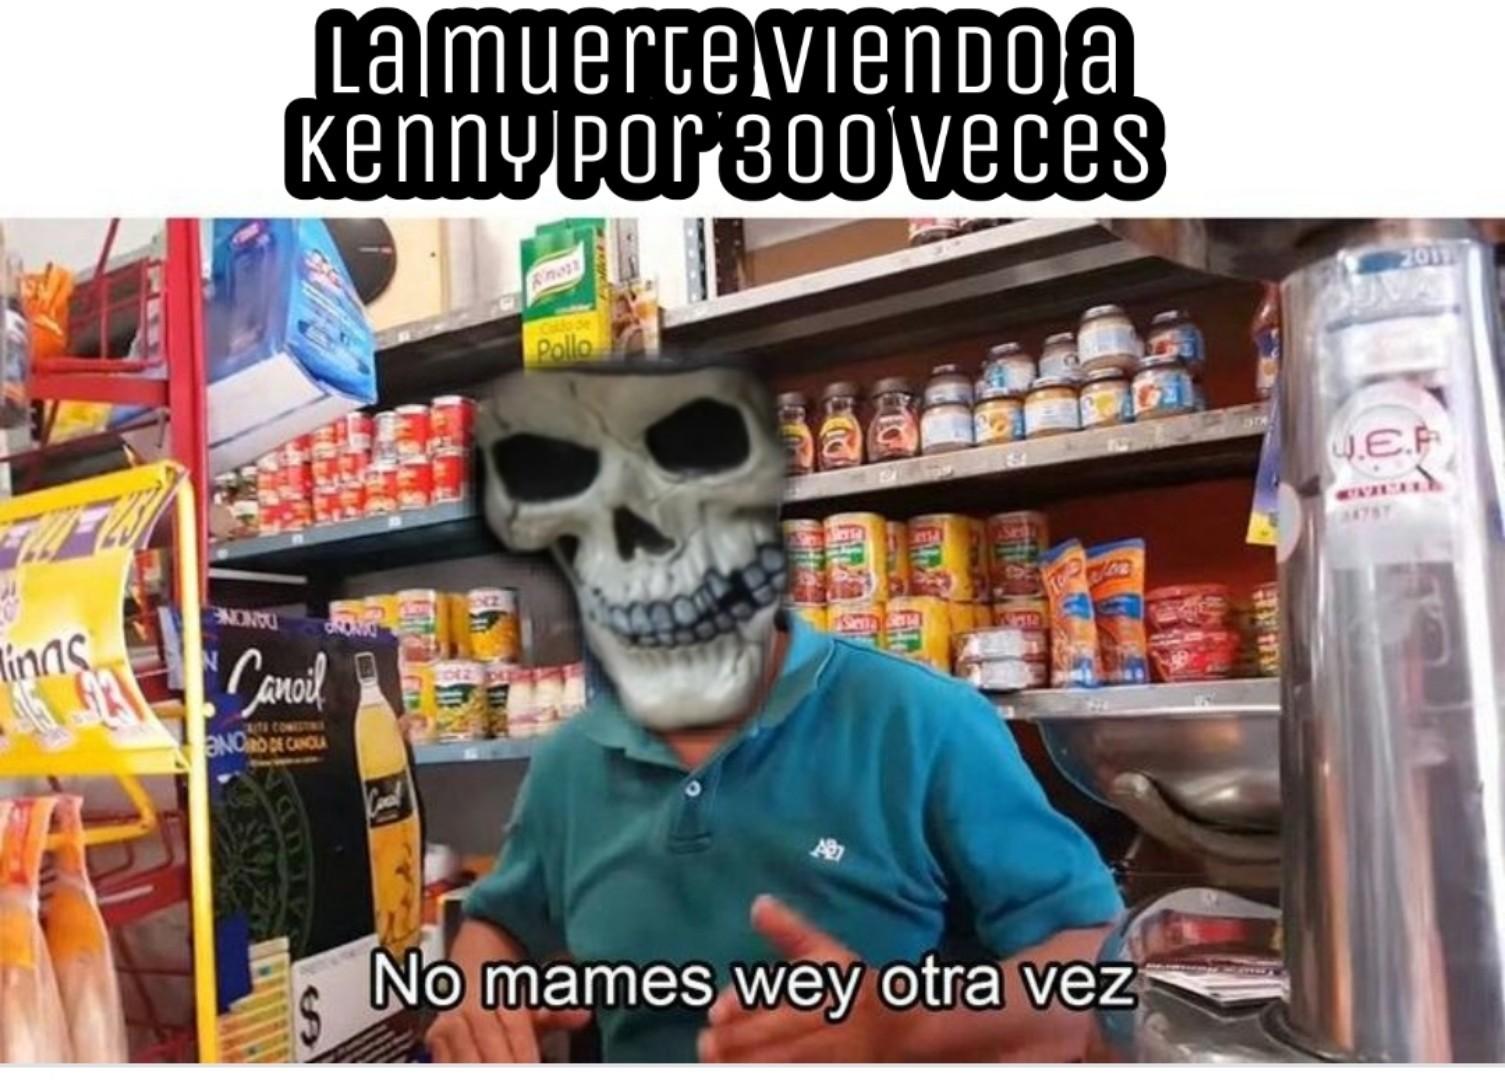 Ste Kenny - meme